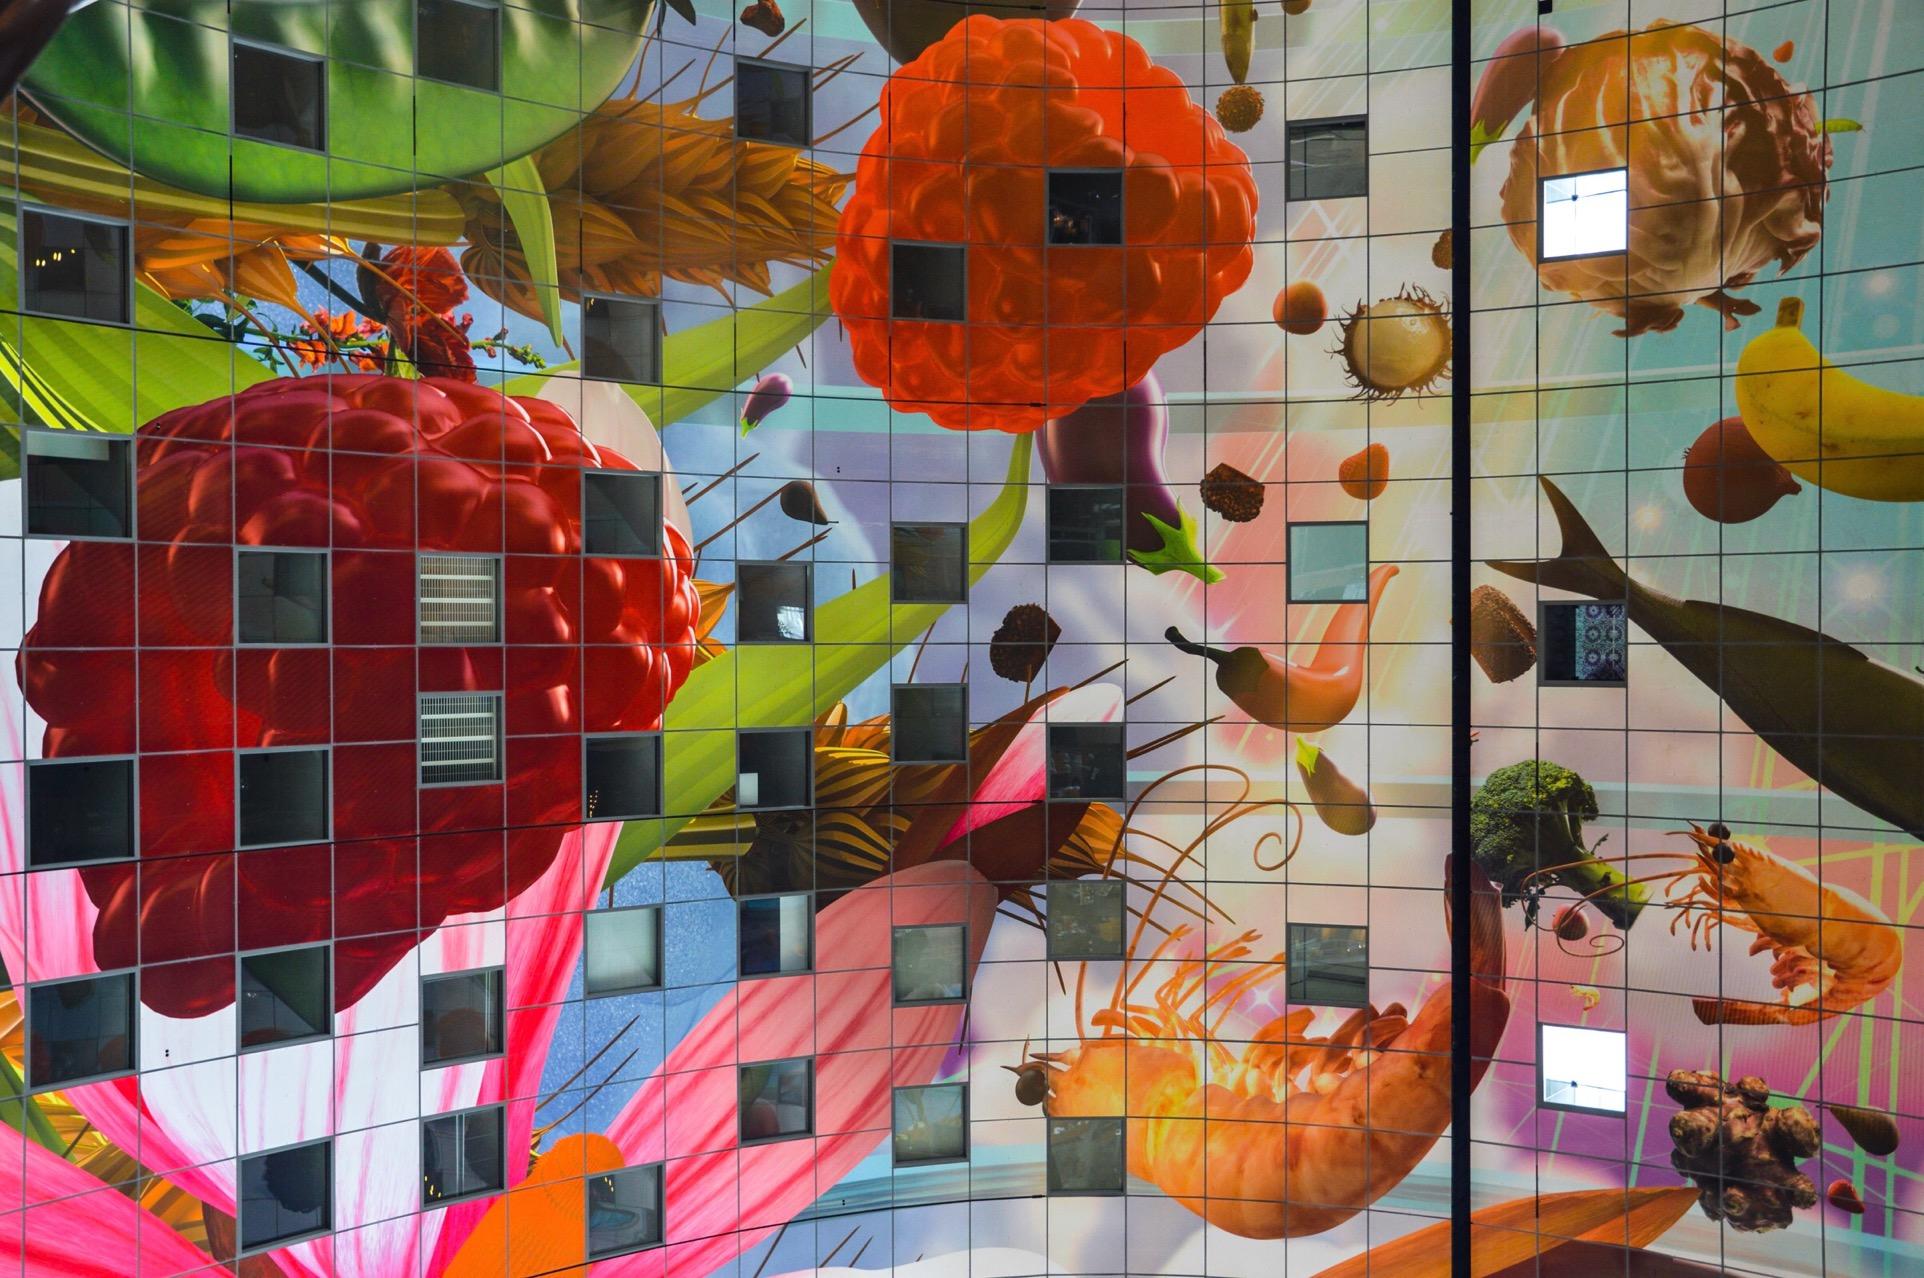 Mural, Rotterdam Market Hall, Netherlands